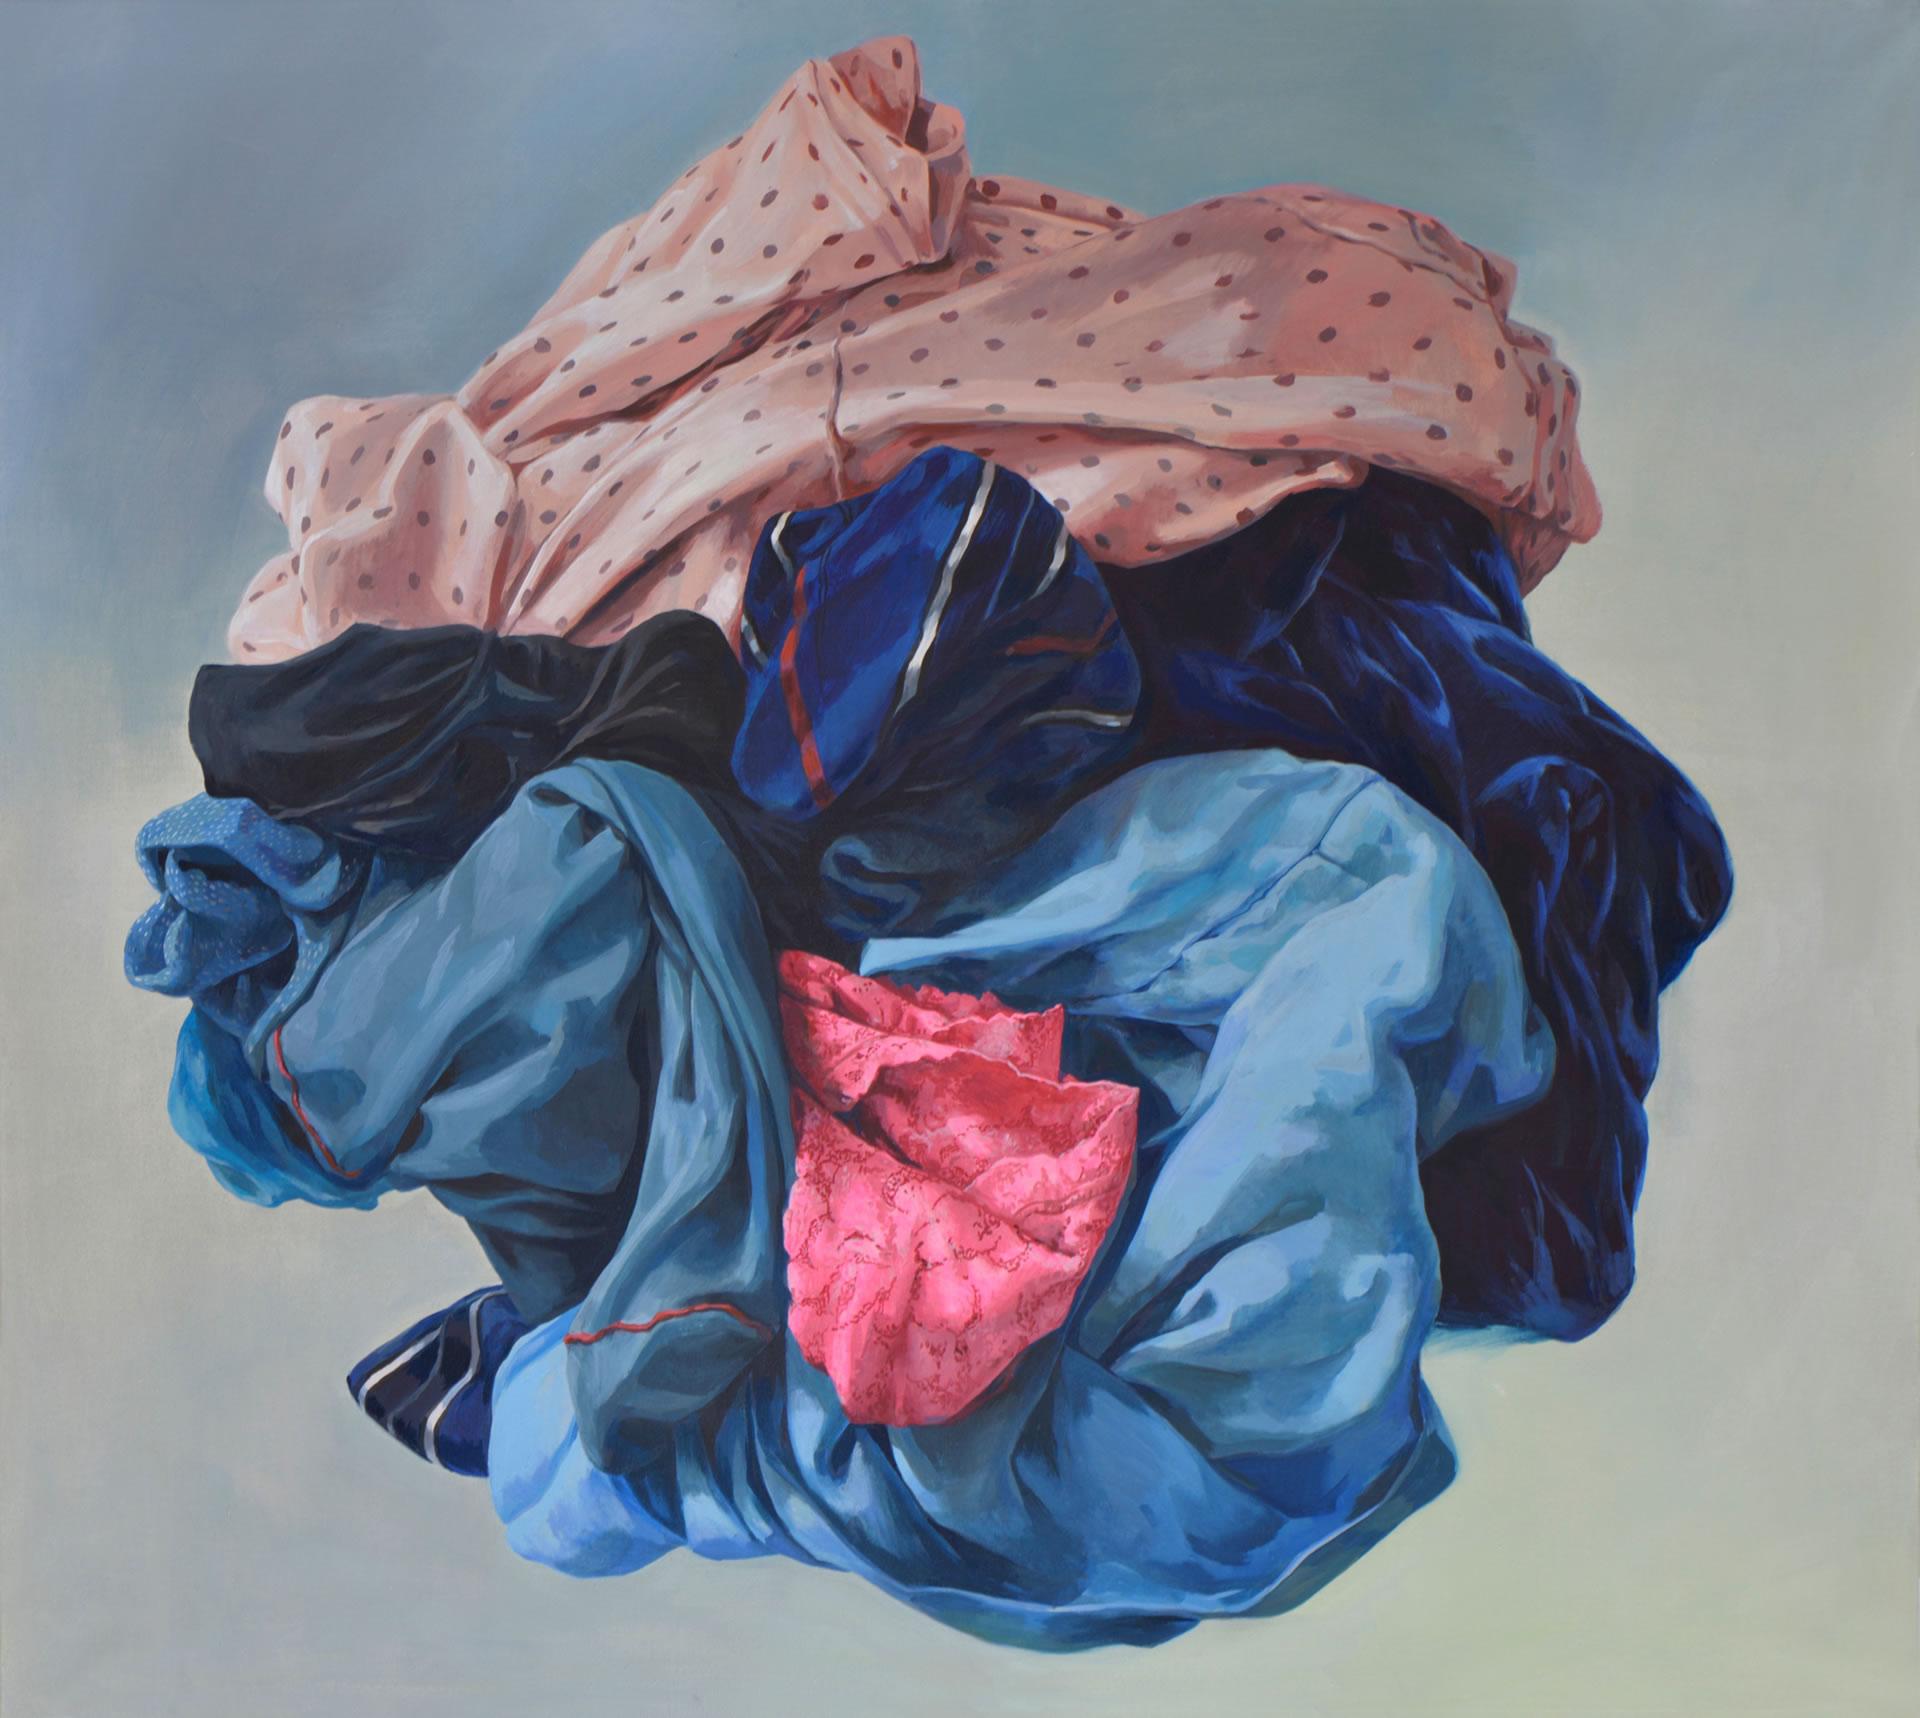 Alina Kunitsyna | Maure aus Reutte | 2018 | Öl auf Leinwand | 160 x 180 cm